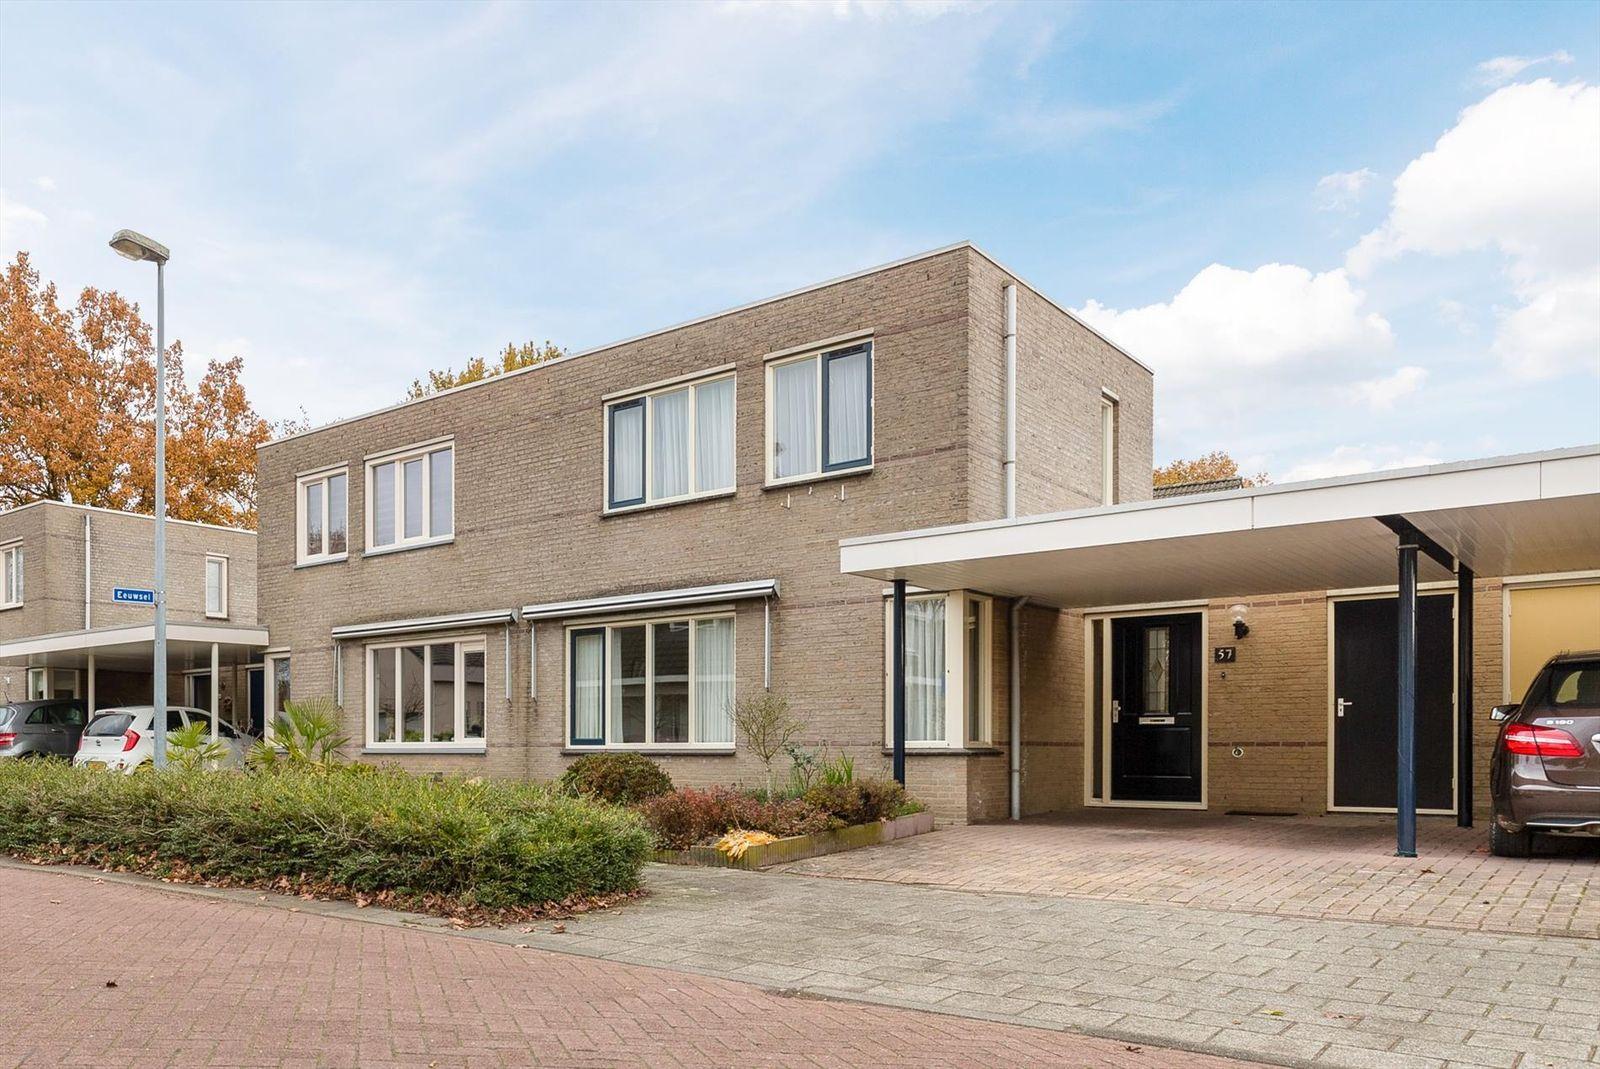 Heikantsebaan 57, Veldhoven